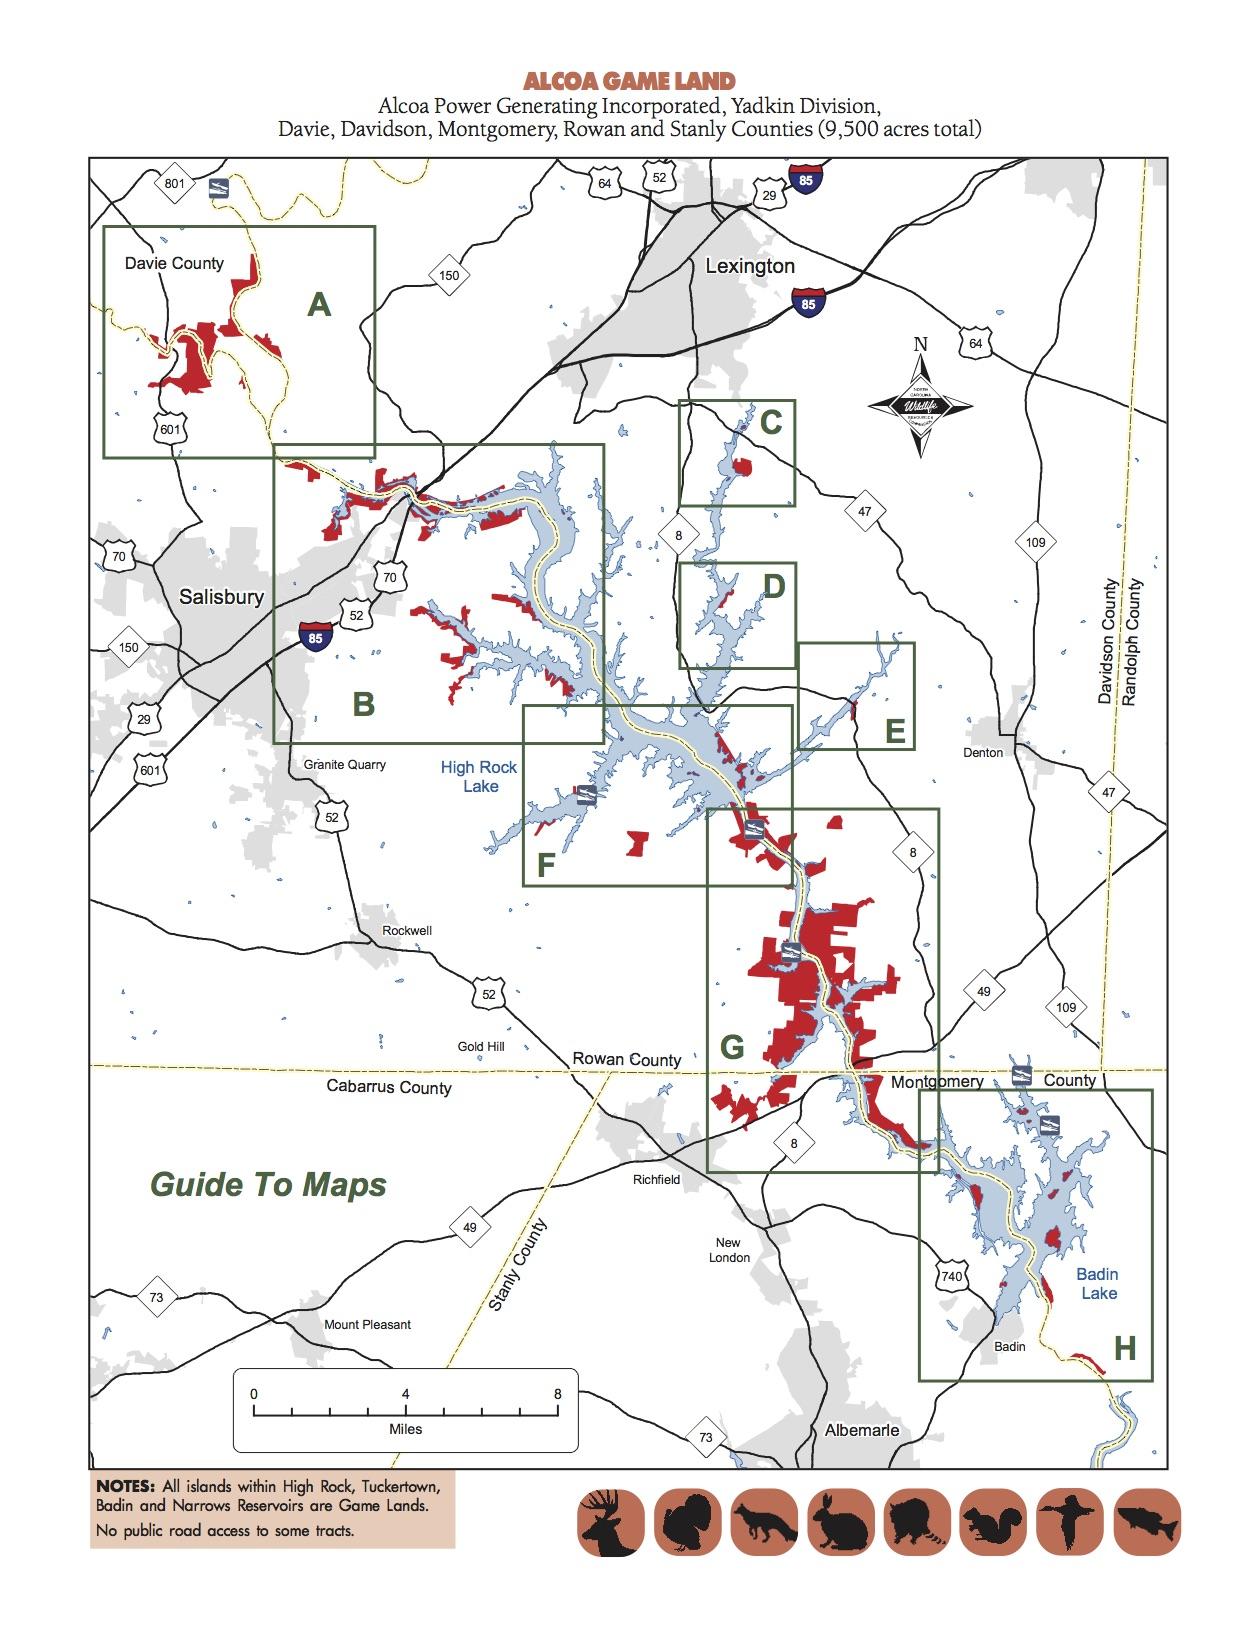 HLRBO - Davidson,North Carolina Hunting Lease on